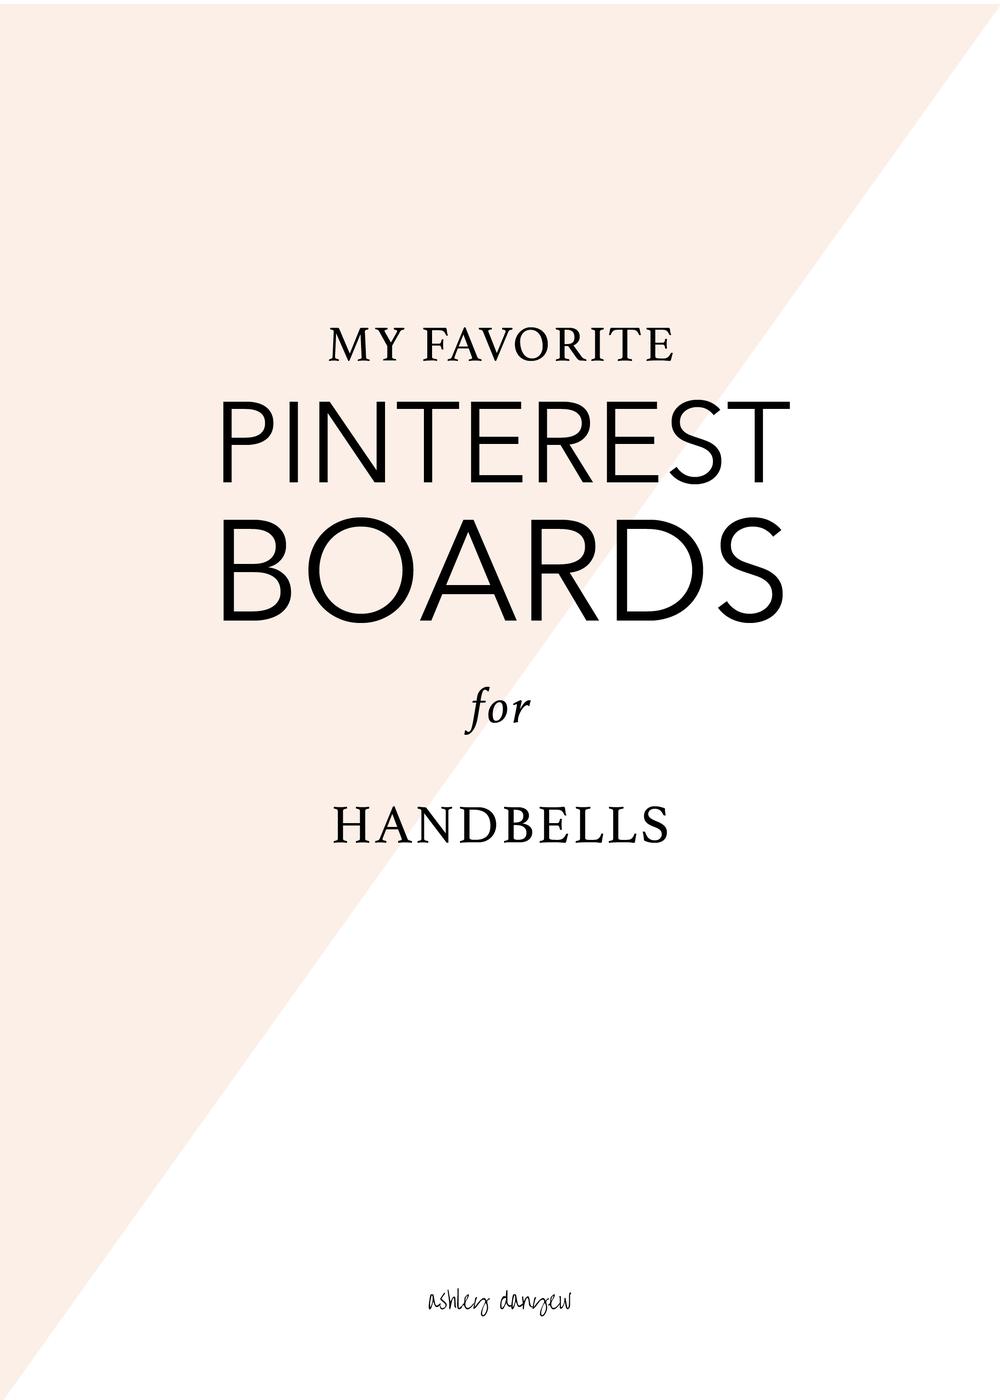 Copy of My Favorite Pinterest Boards for Handbells